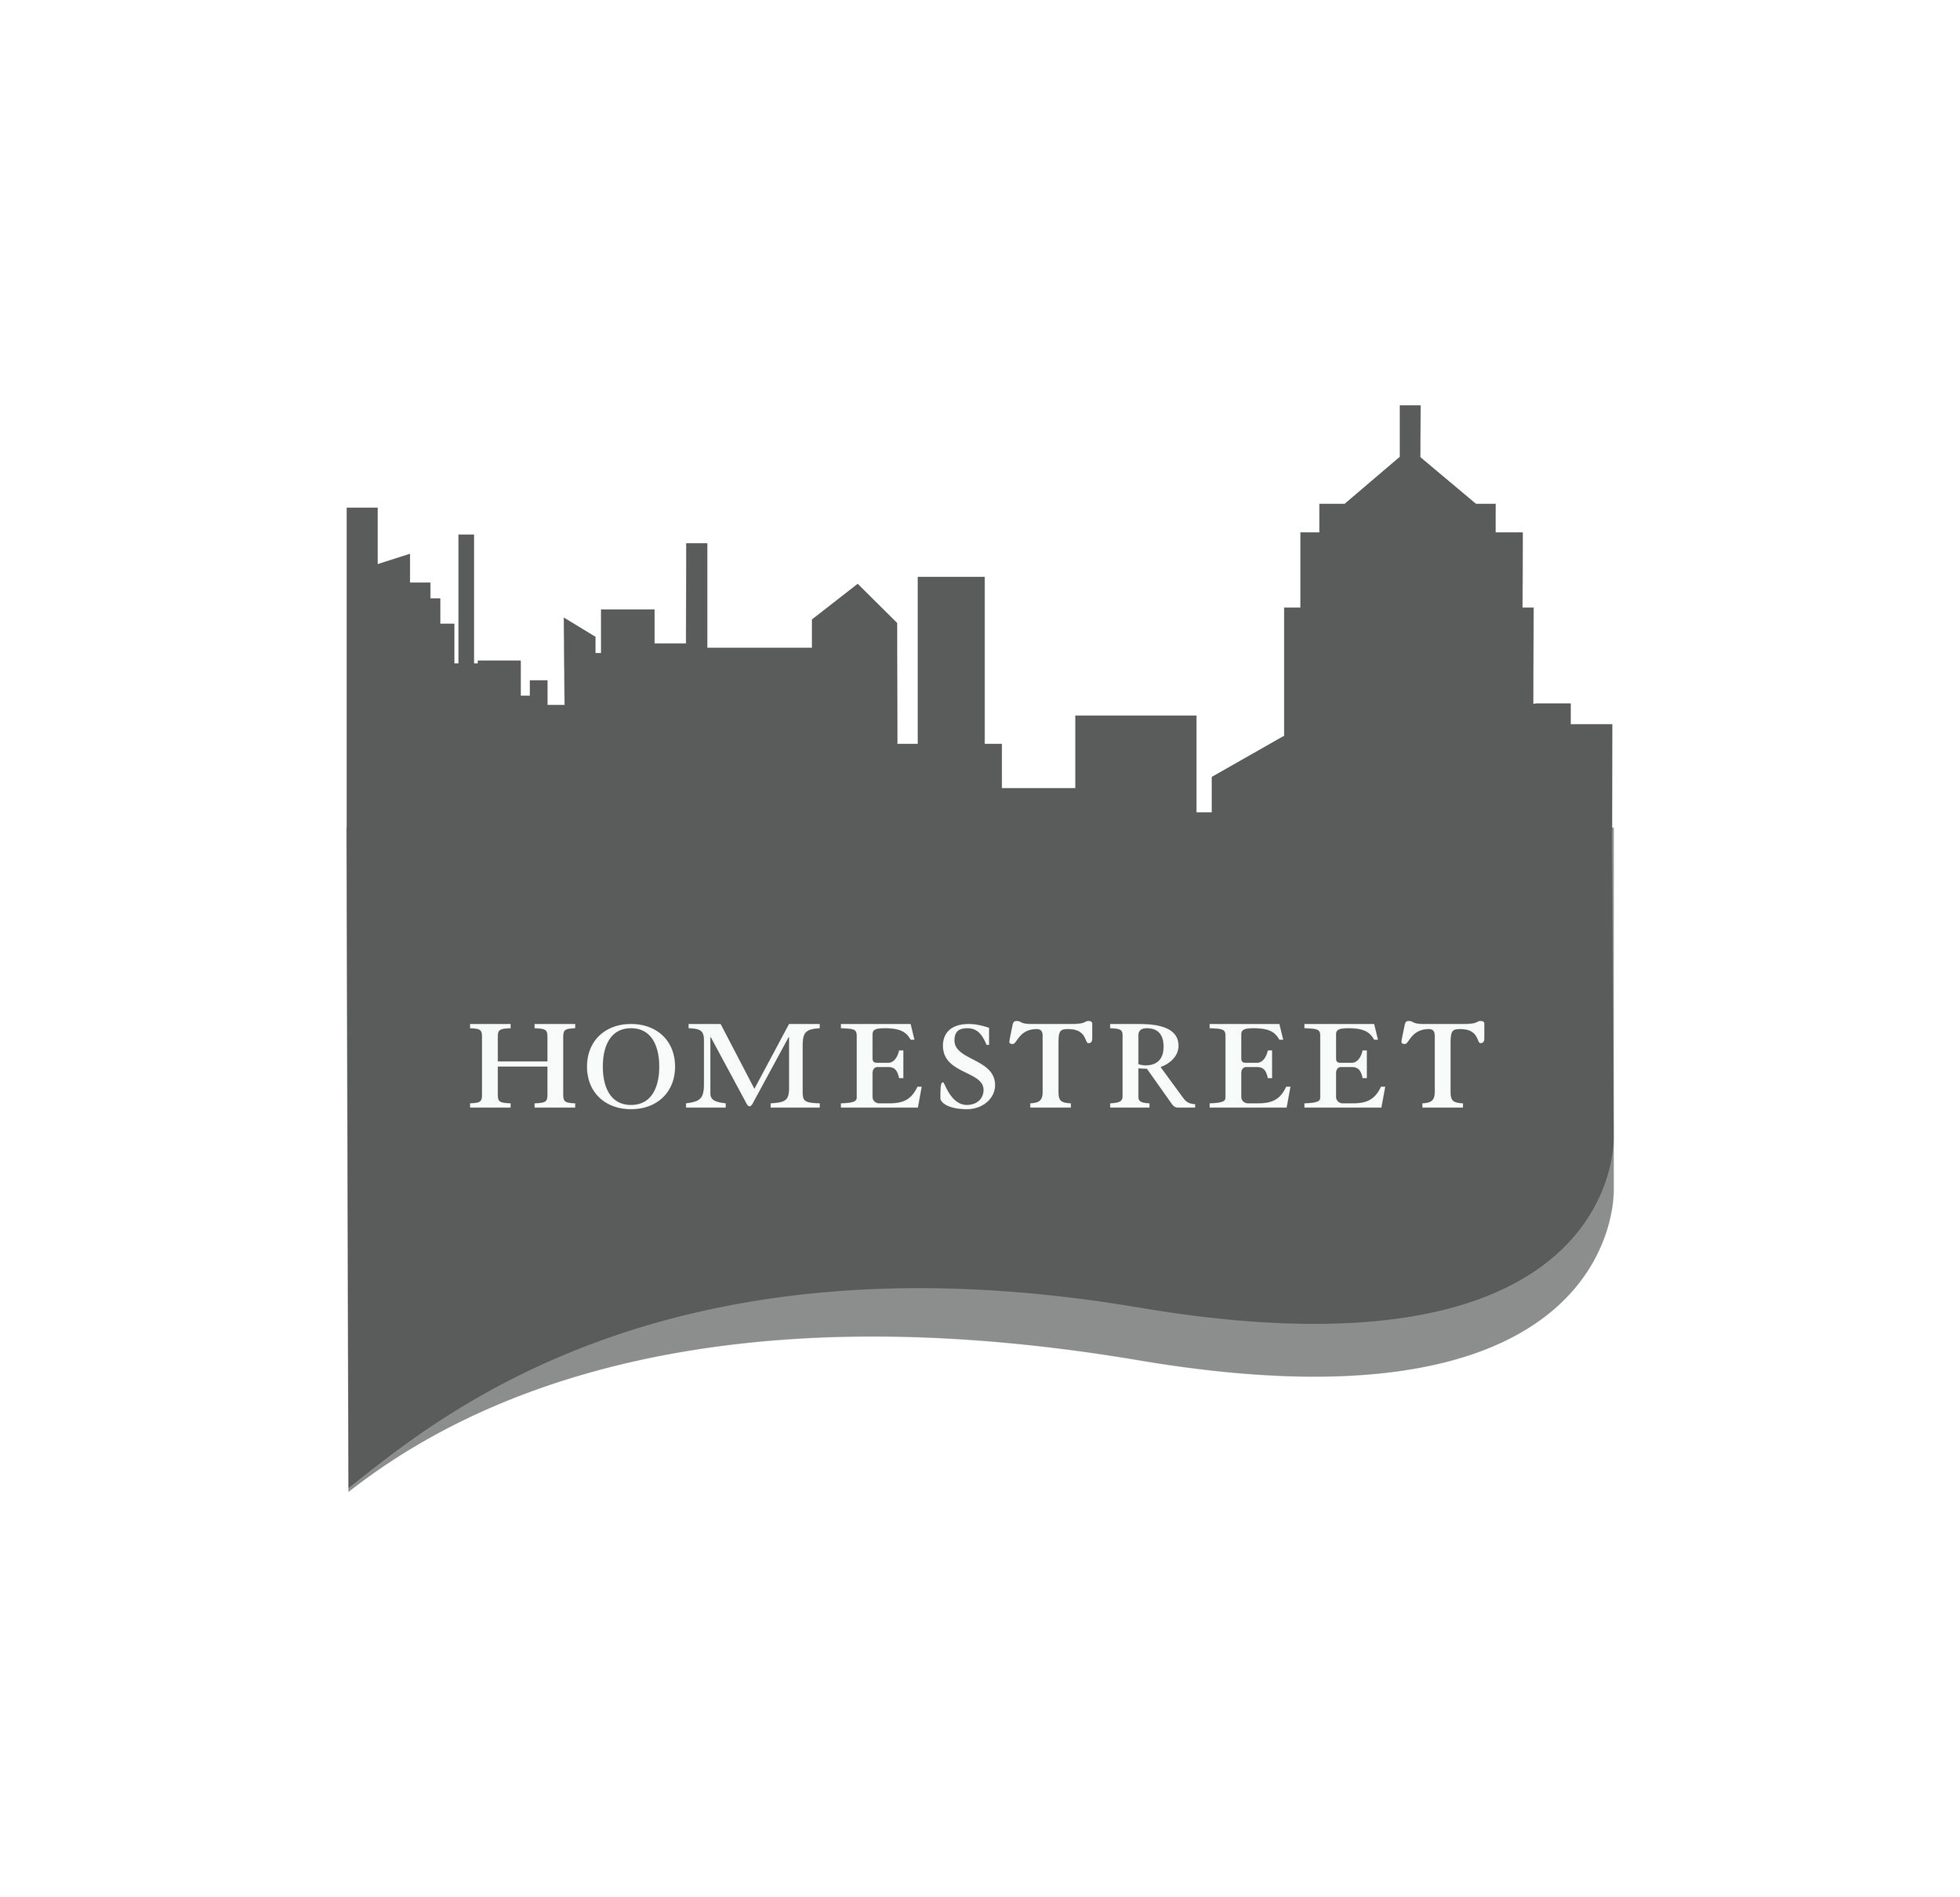 HOMESTREET_5.jpg